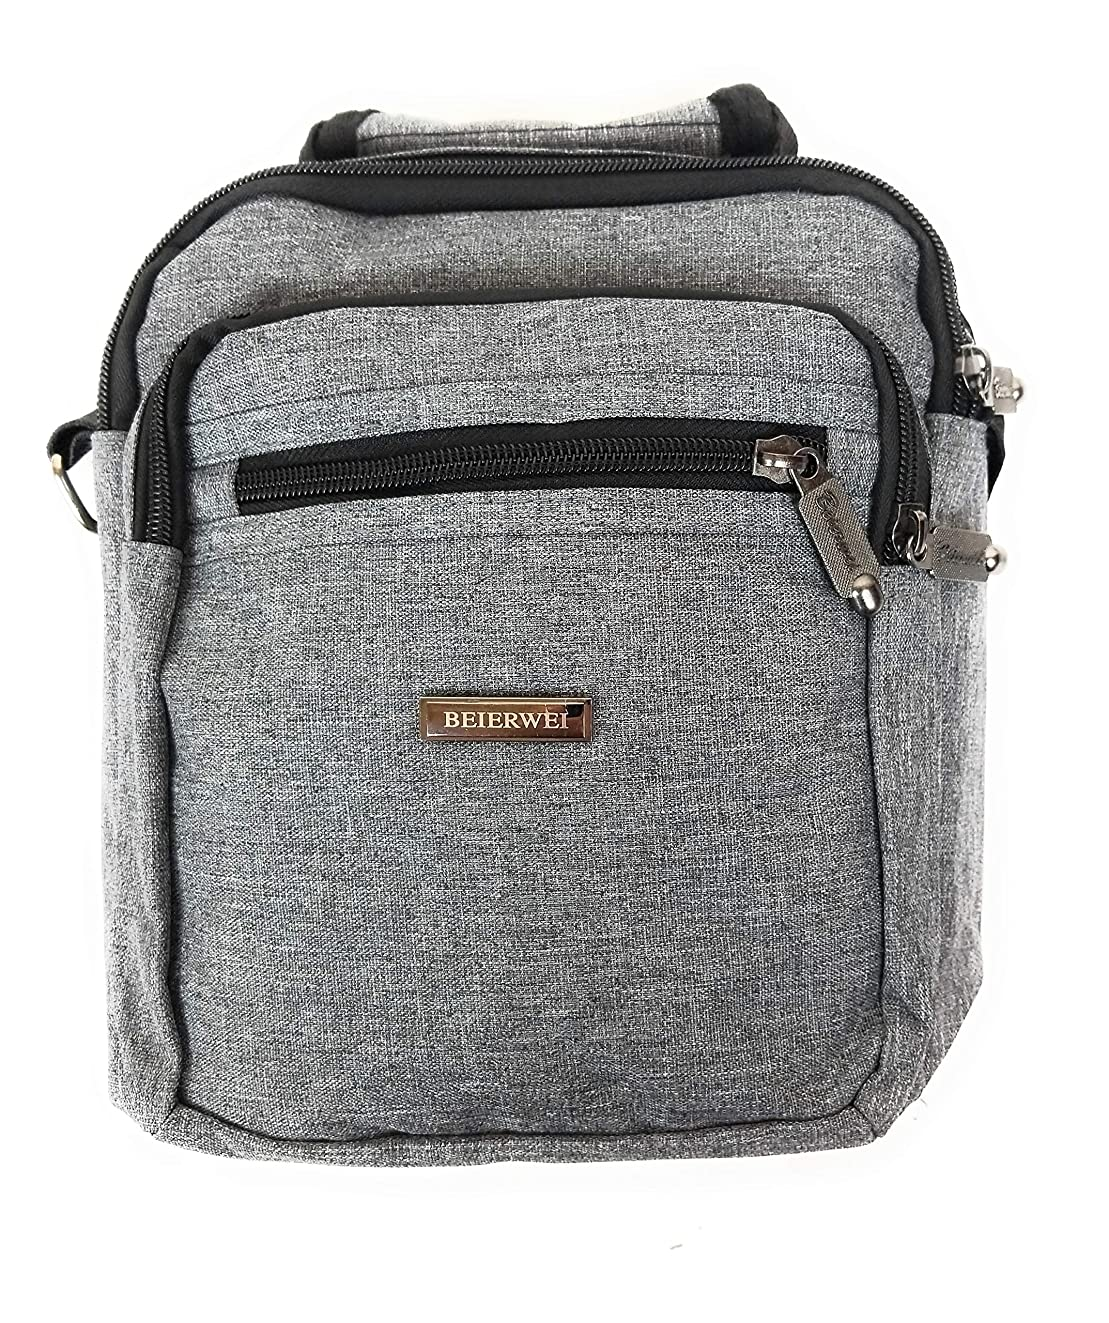 Canvas Messenger Sling Crossbody Bag Satchel Perfect for iPad Mini, Kindle, E-Readers Men Women Students (Grey)